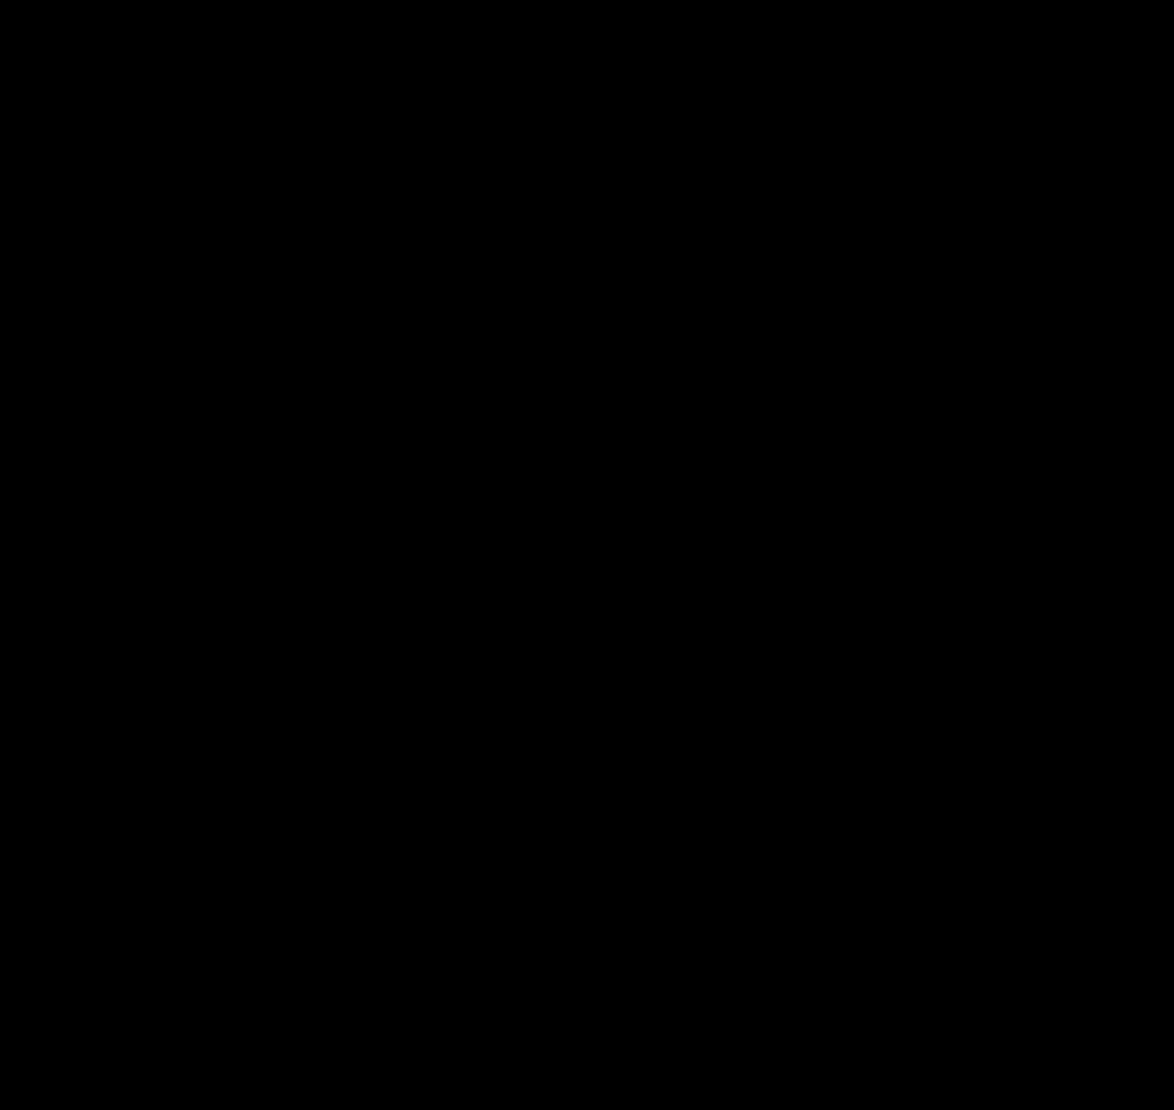 2-Phenoxypyrimidine-5-boronic acid pinacol ester